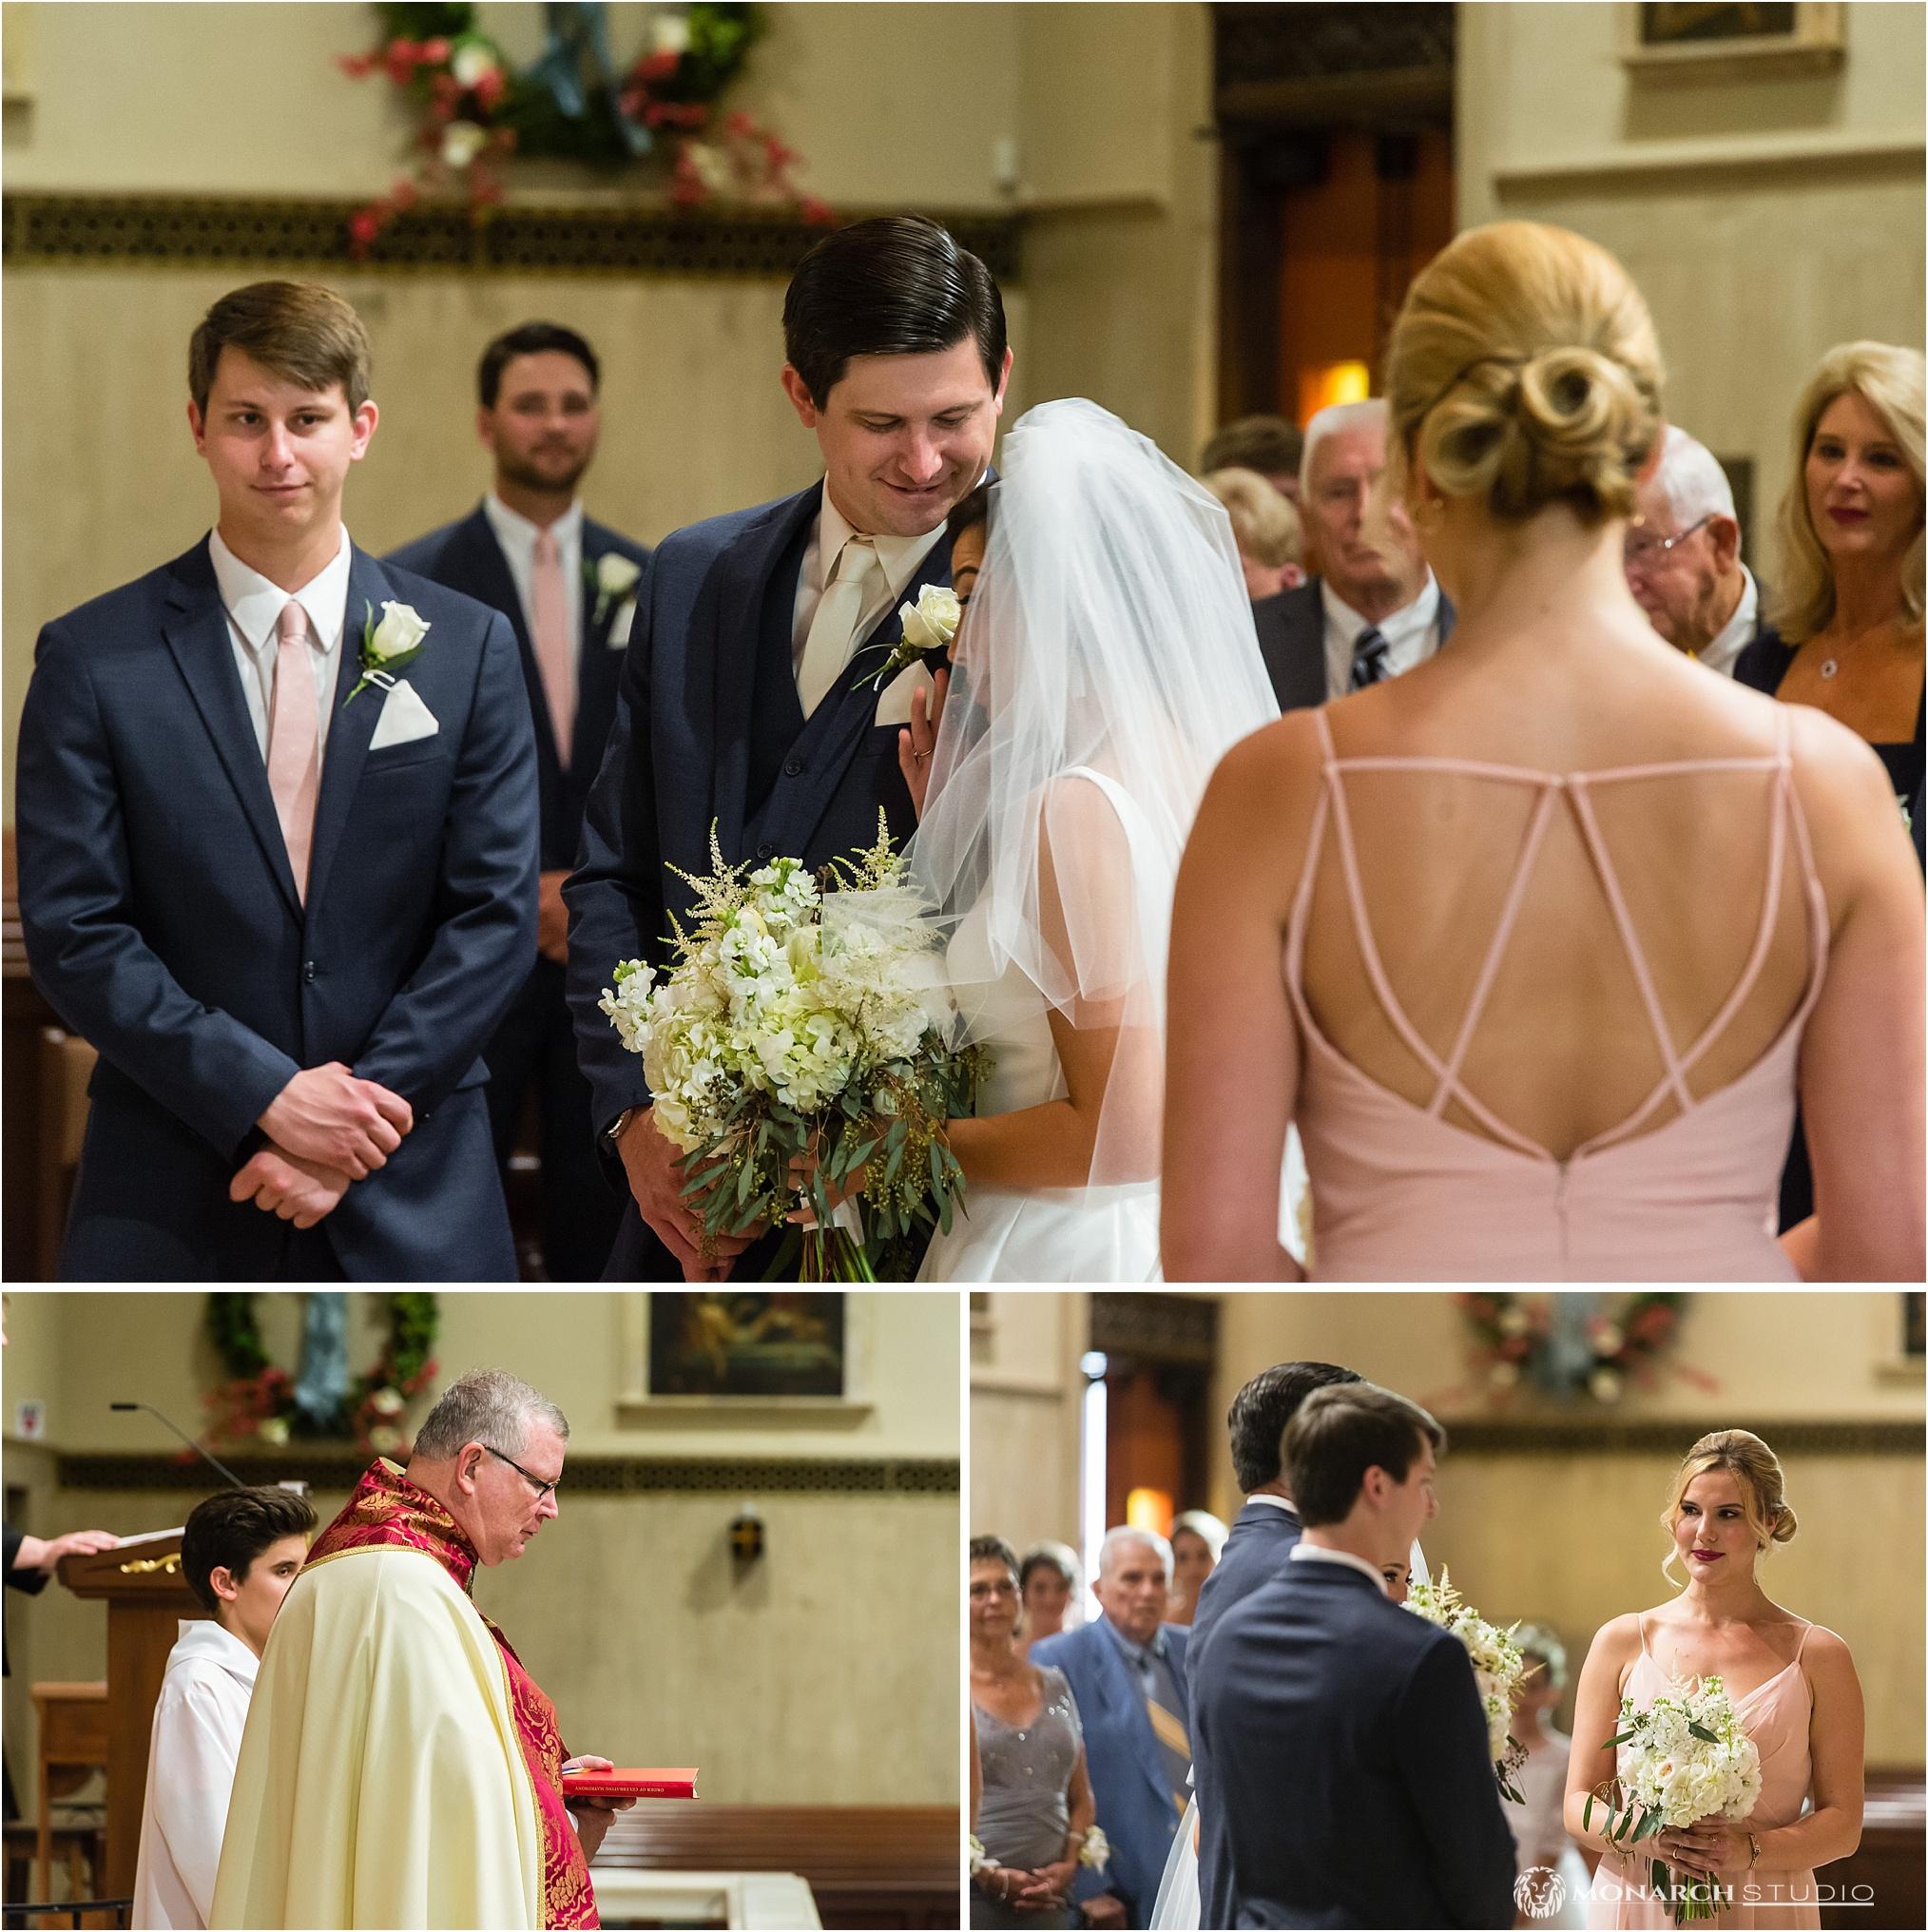 st-augustine-wedding-photographer-050.jpg